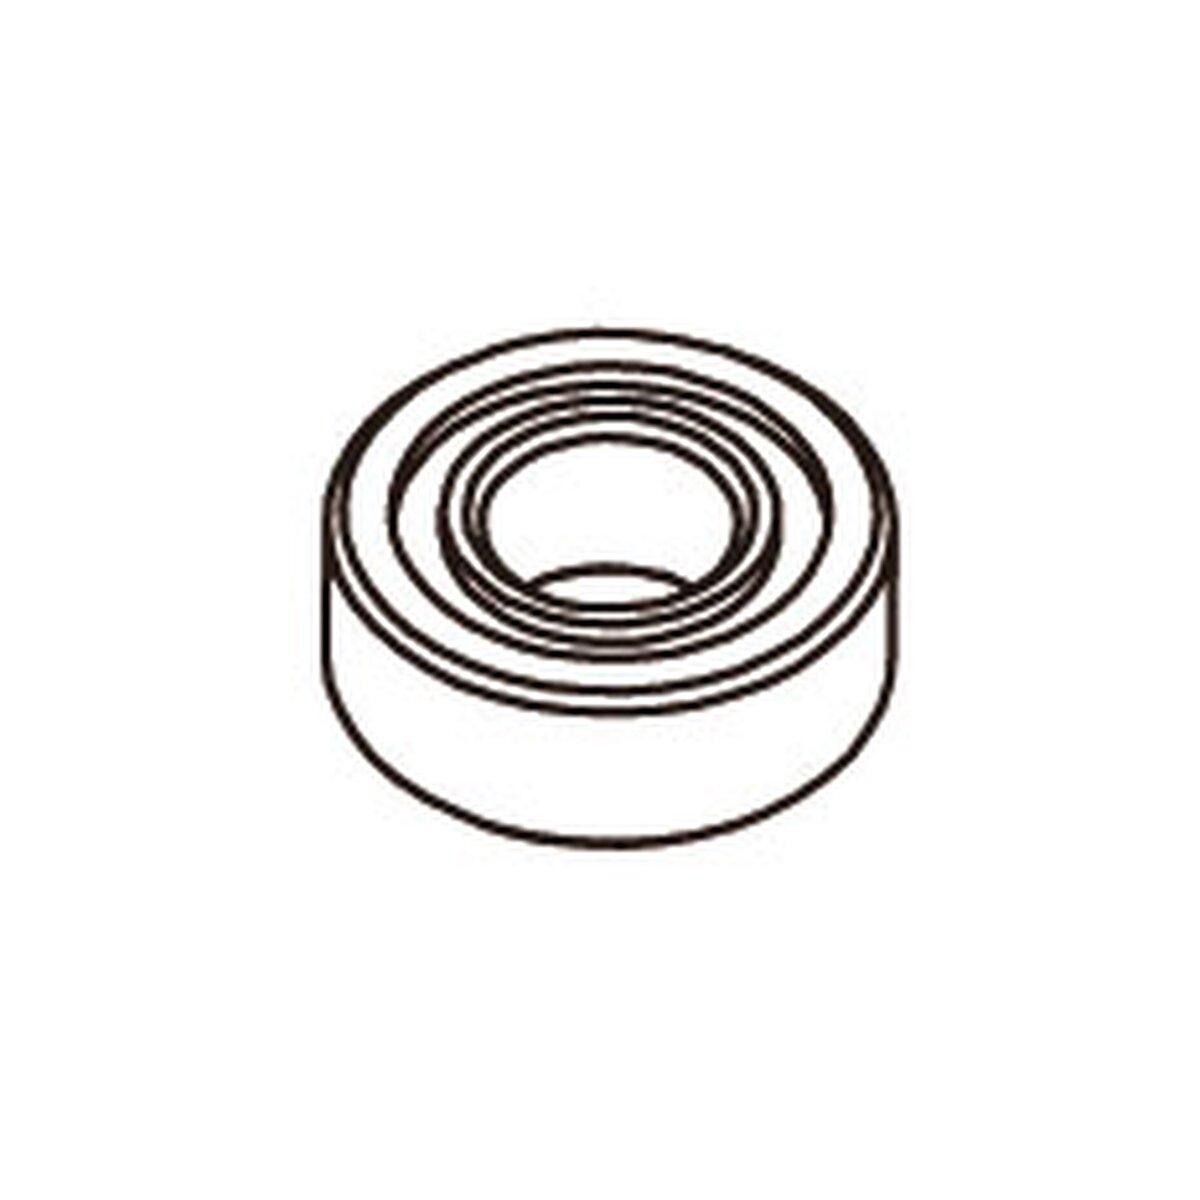 Kugellager 5x11x4 LD3 Pro-RTR / FS